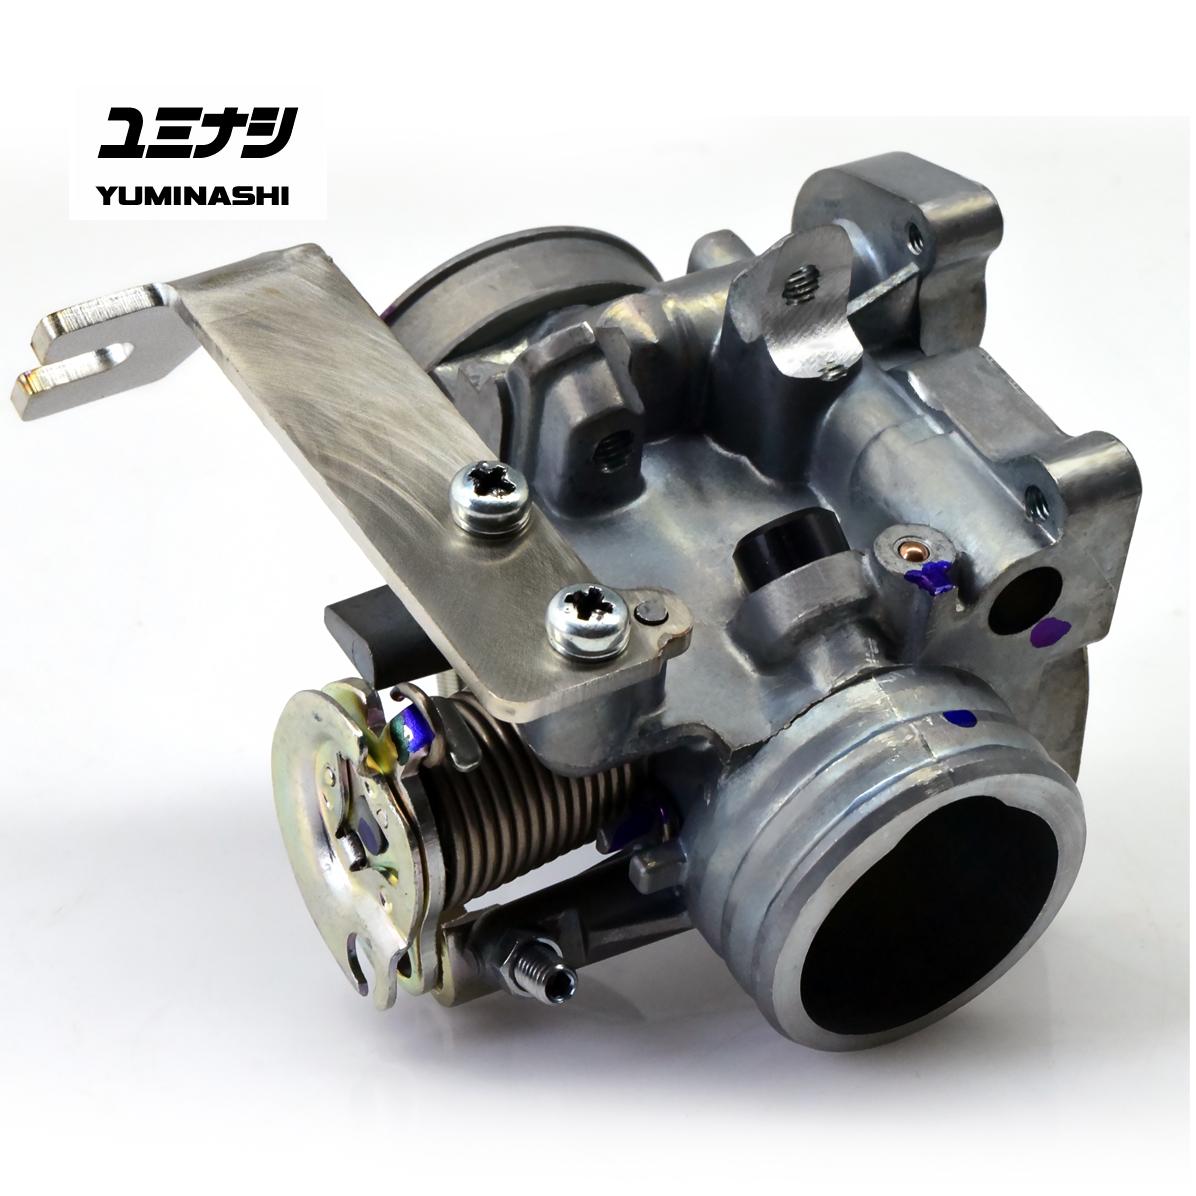 New 2018 Model 31mm Pgm Fi Throttle Body Upgrade Set Filter Fuel Pump Vario 125 Loading Zoom